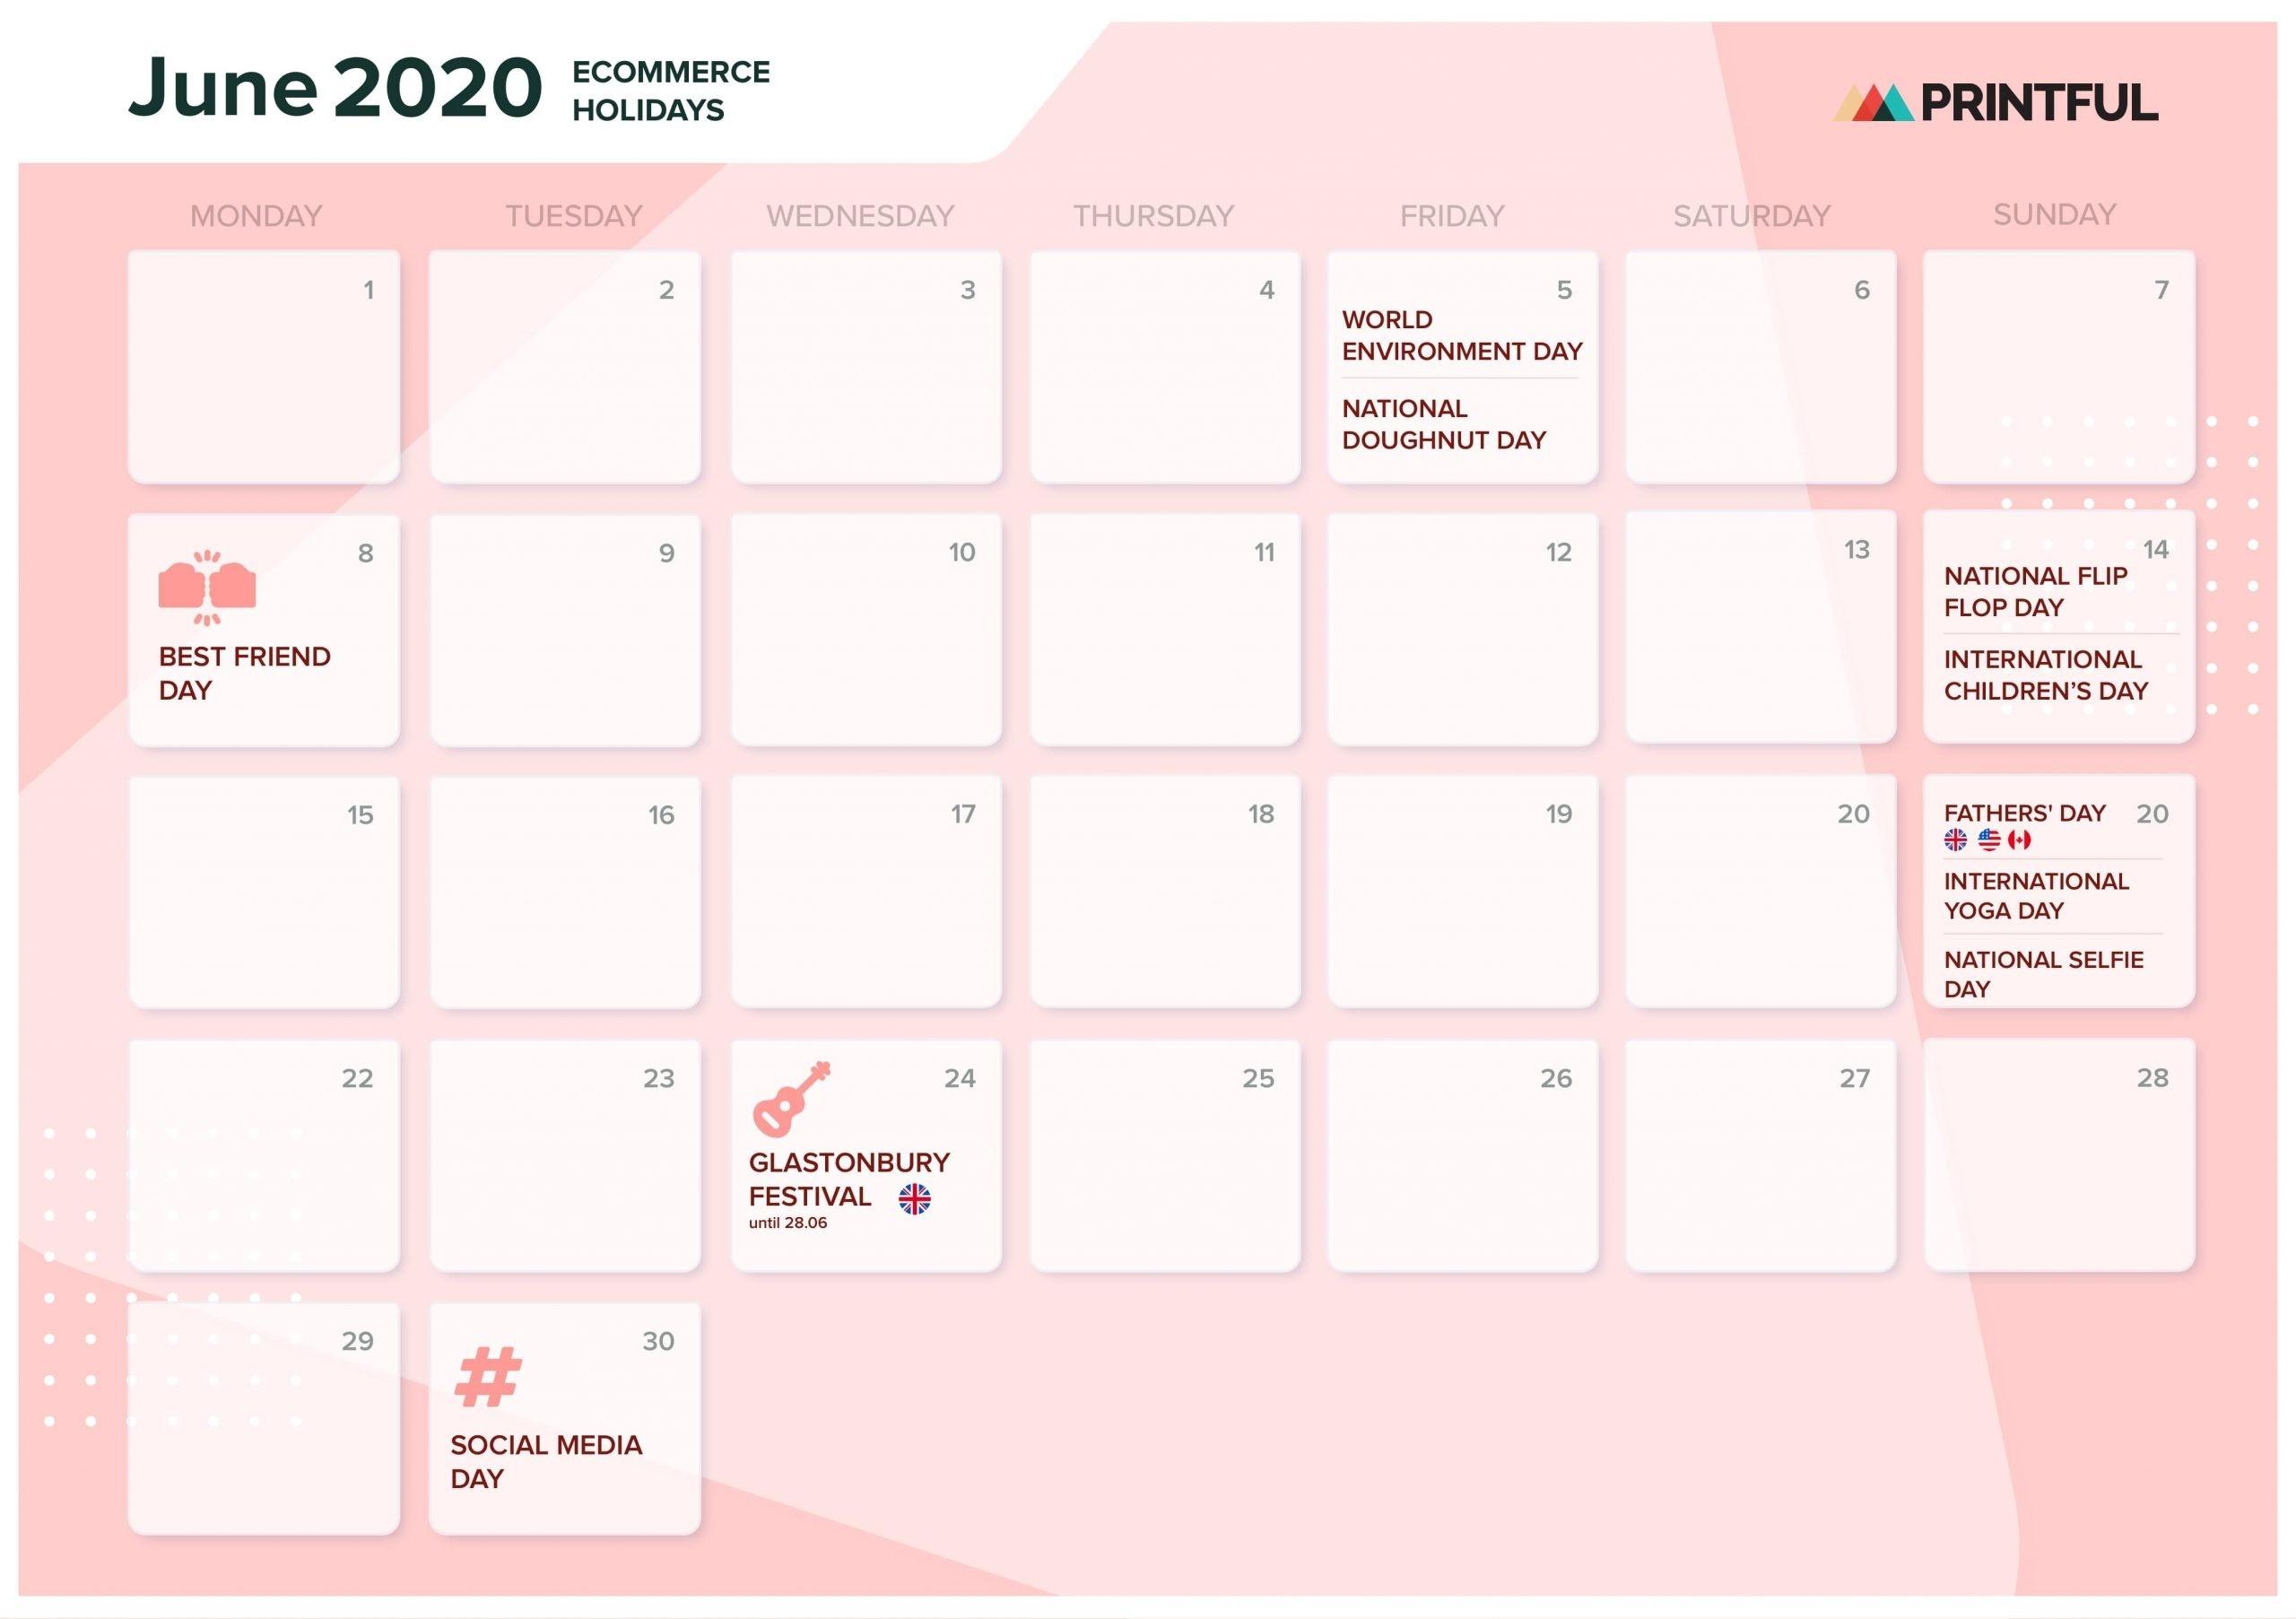 The Ultimate 2020 Ecommerce Holiday Marketing Calendar  Design 7 Days Calendar Pdf